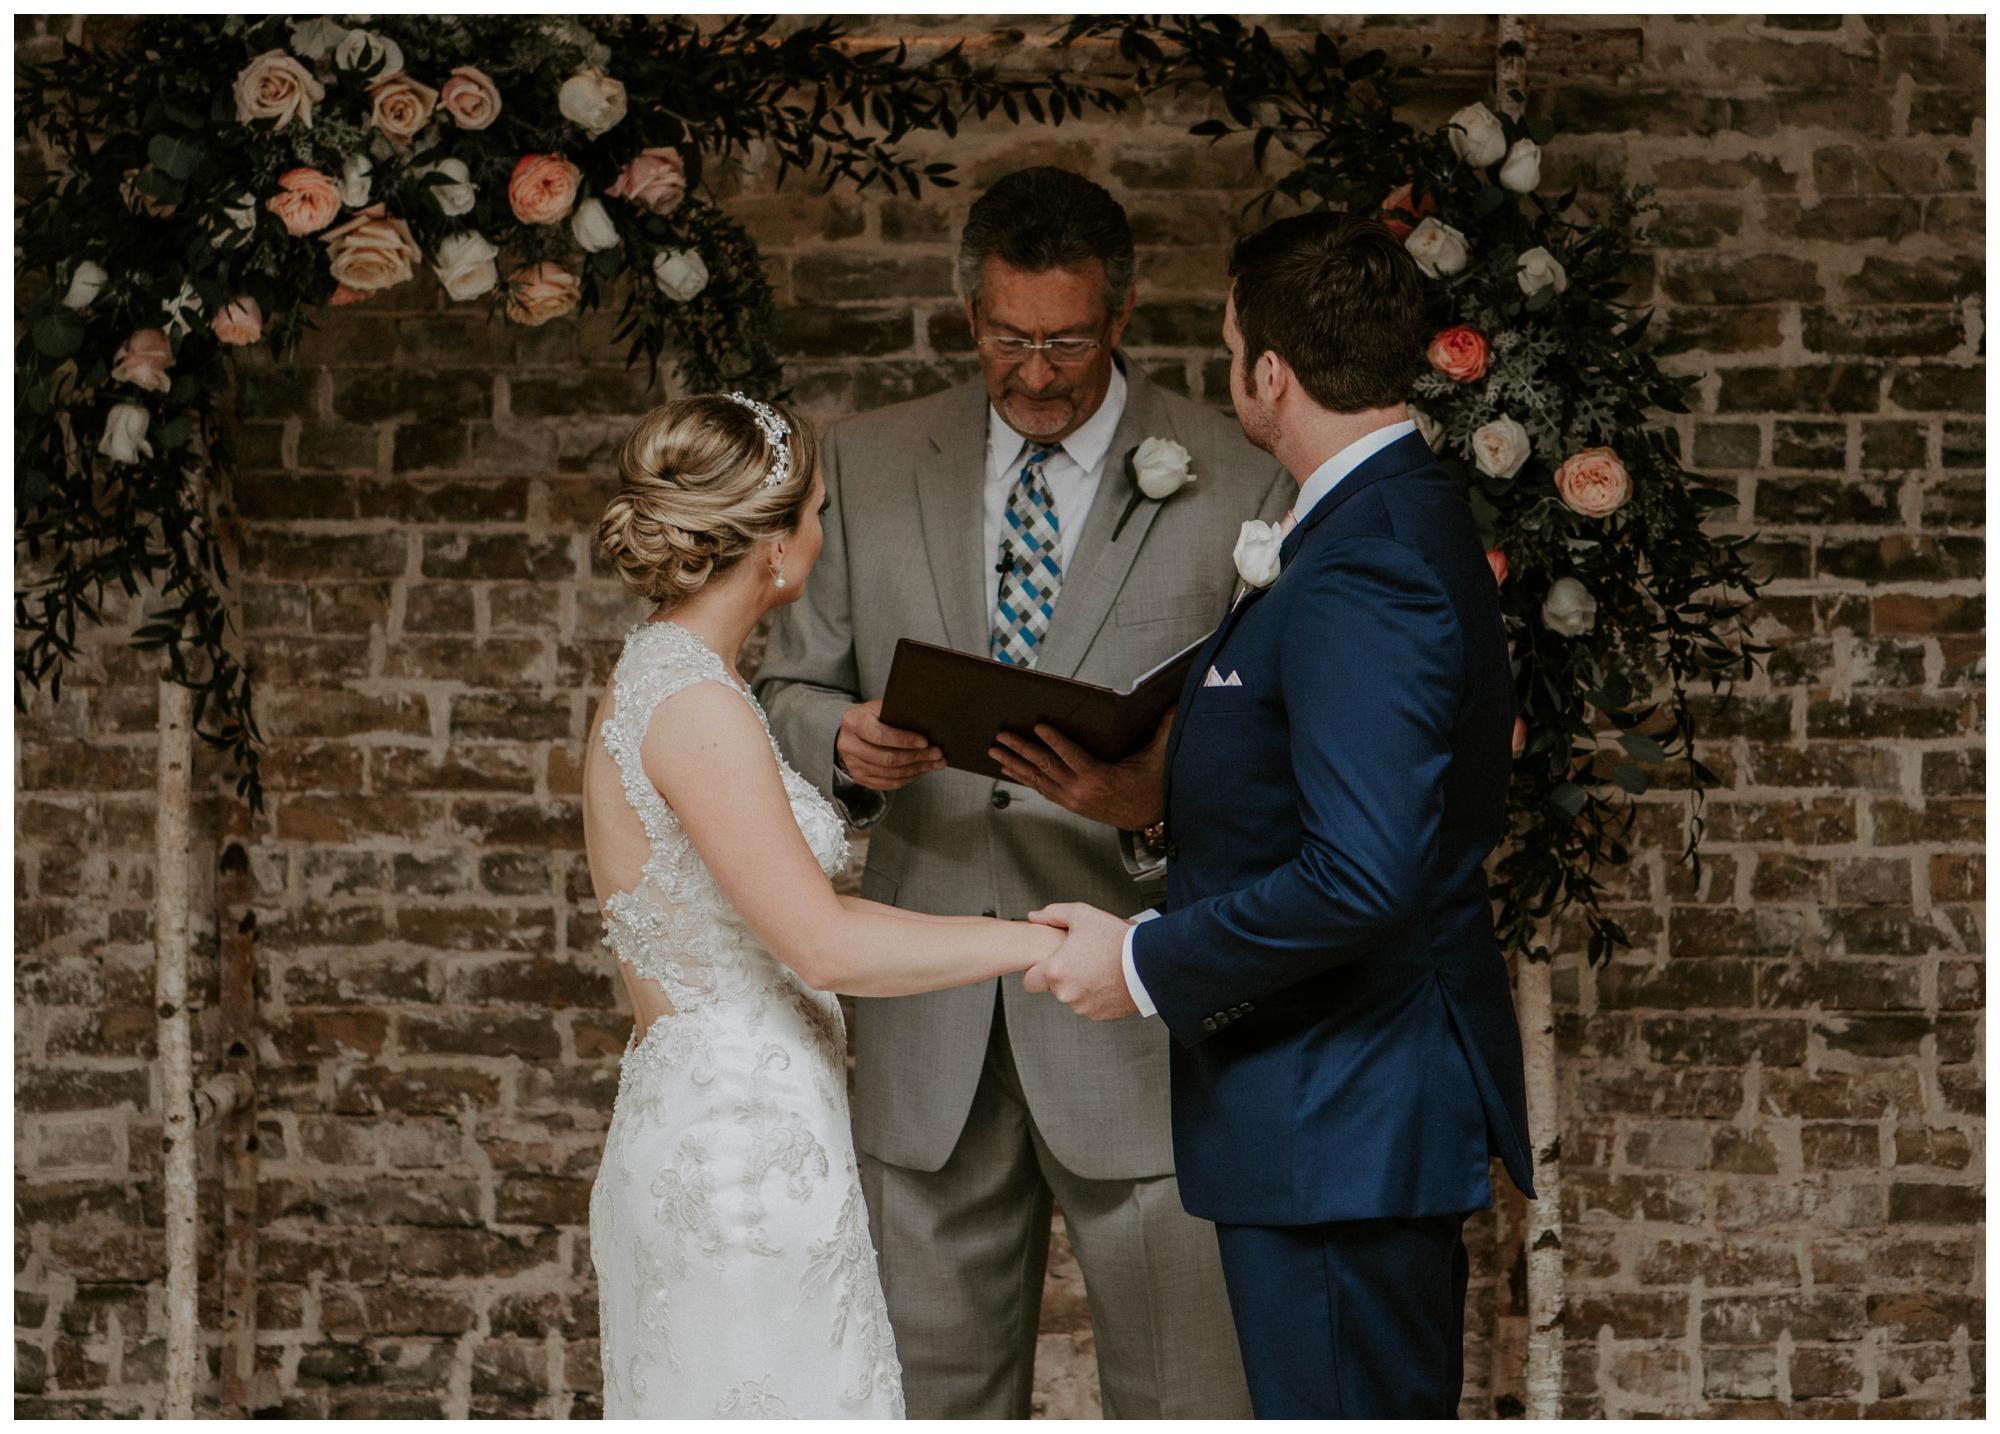 austin-texas-wedding-photography-1778-photographie_0057.jpg